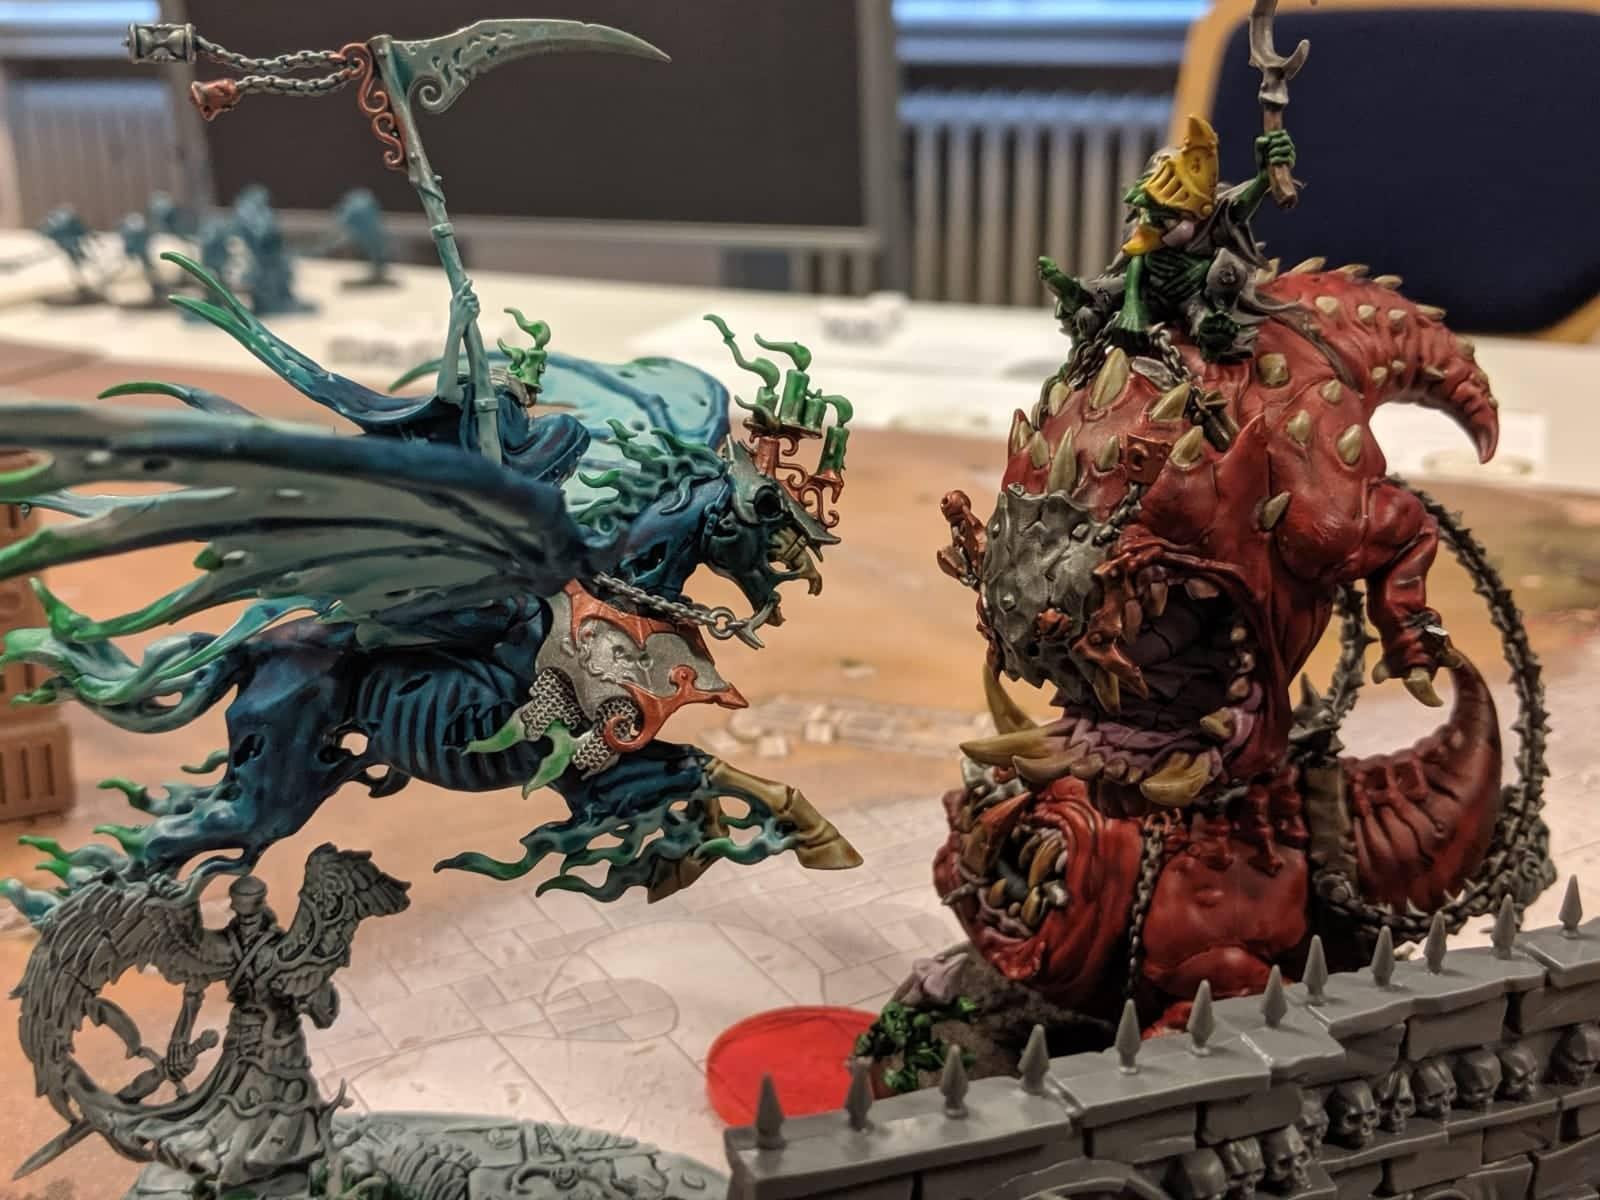 Kampf der Krieger im Tabletop